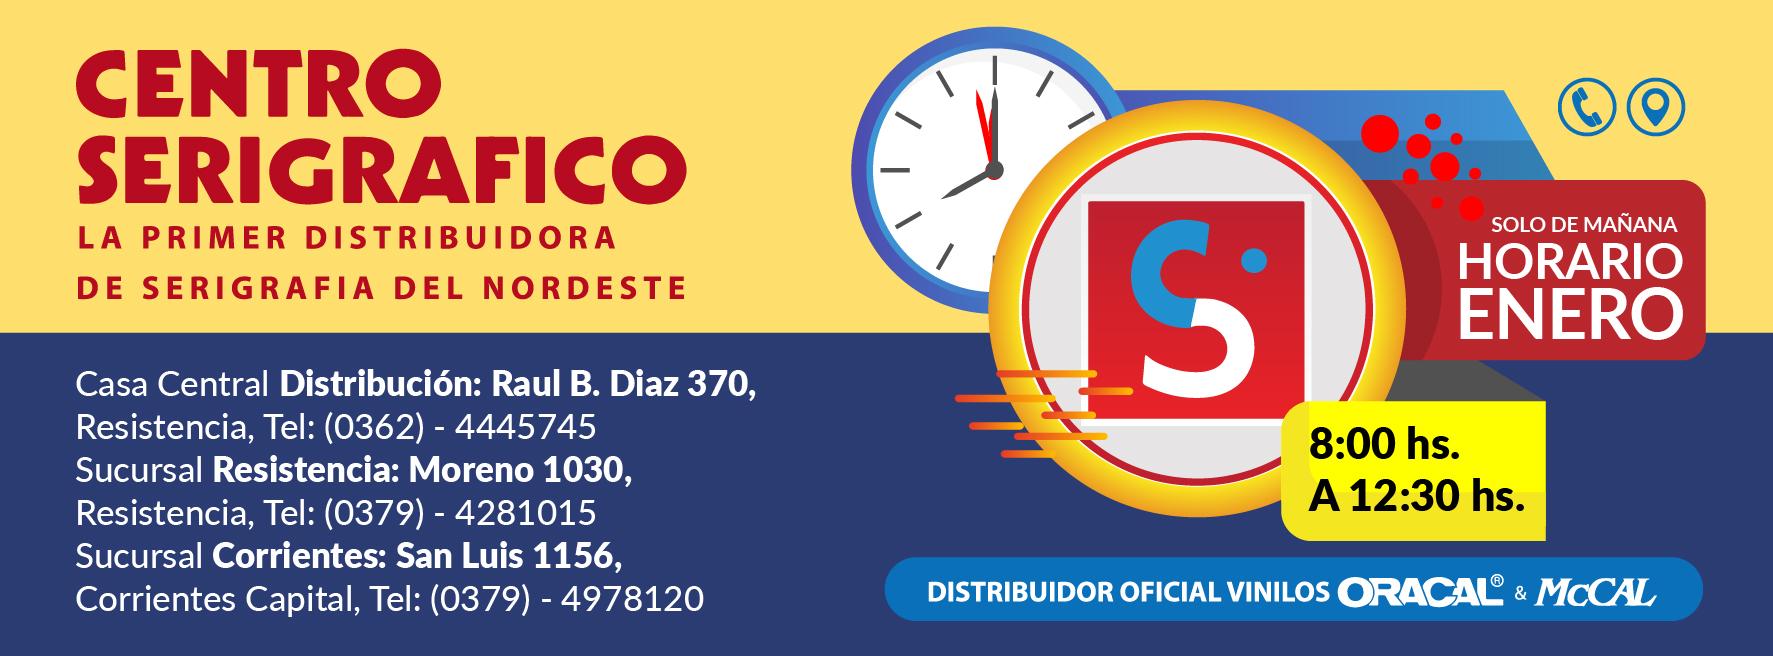 CENTROSERIGRAFICO_horario_enero2020-05